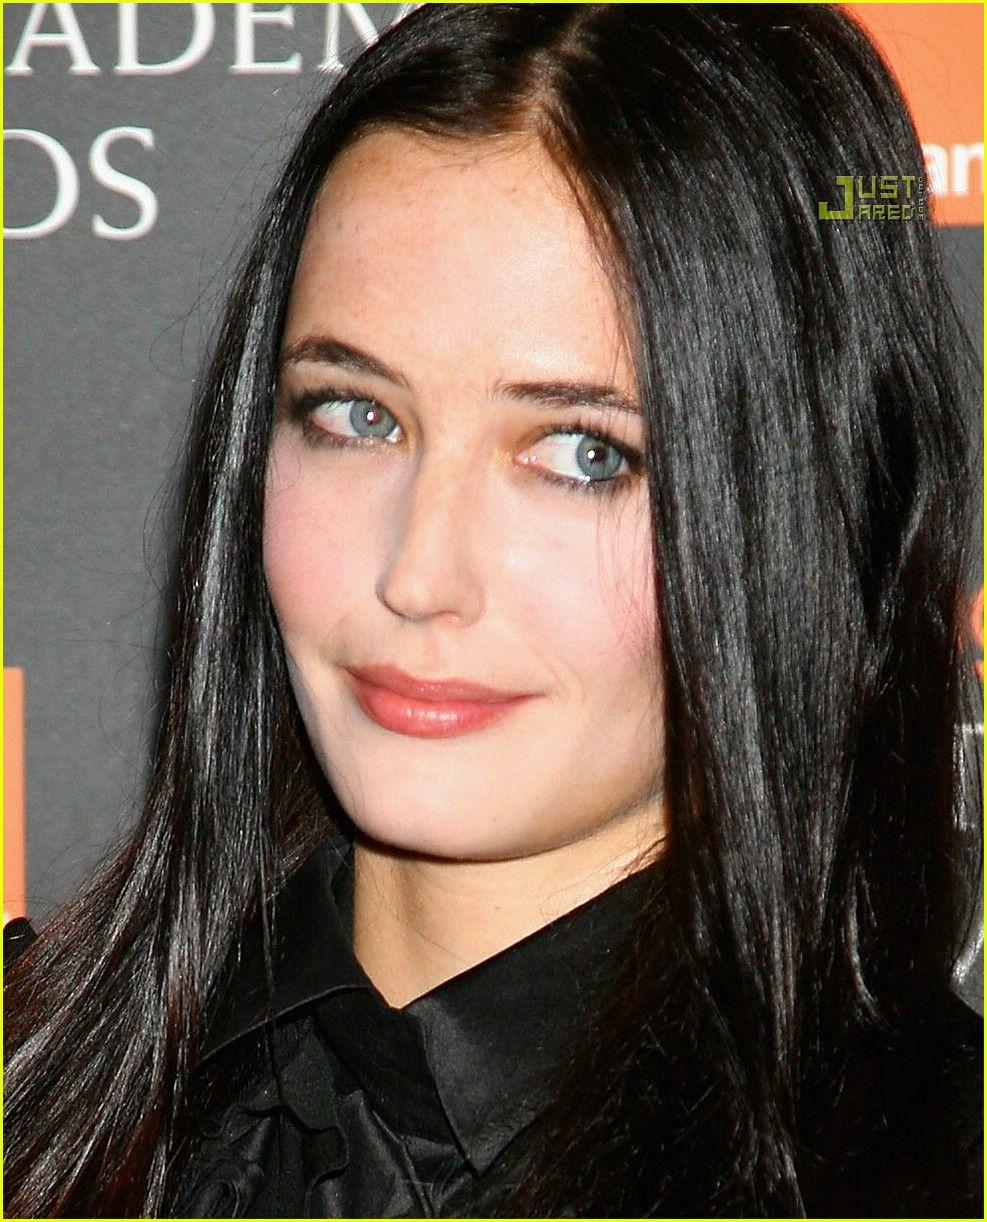 Something So Pretty About Dark Hair And Light Eyes Actress Eva Green Eva Green Dark Hair